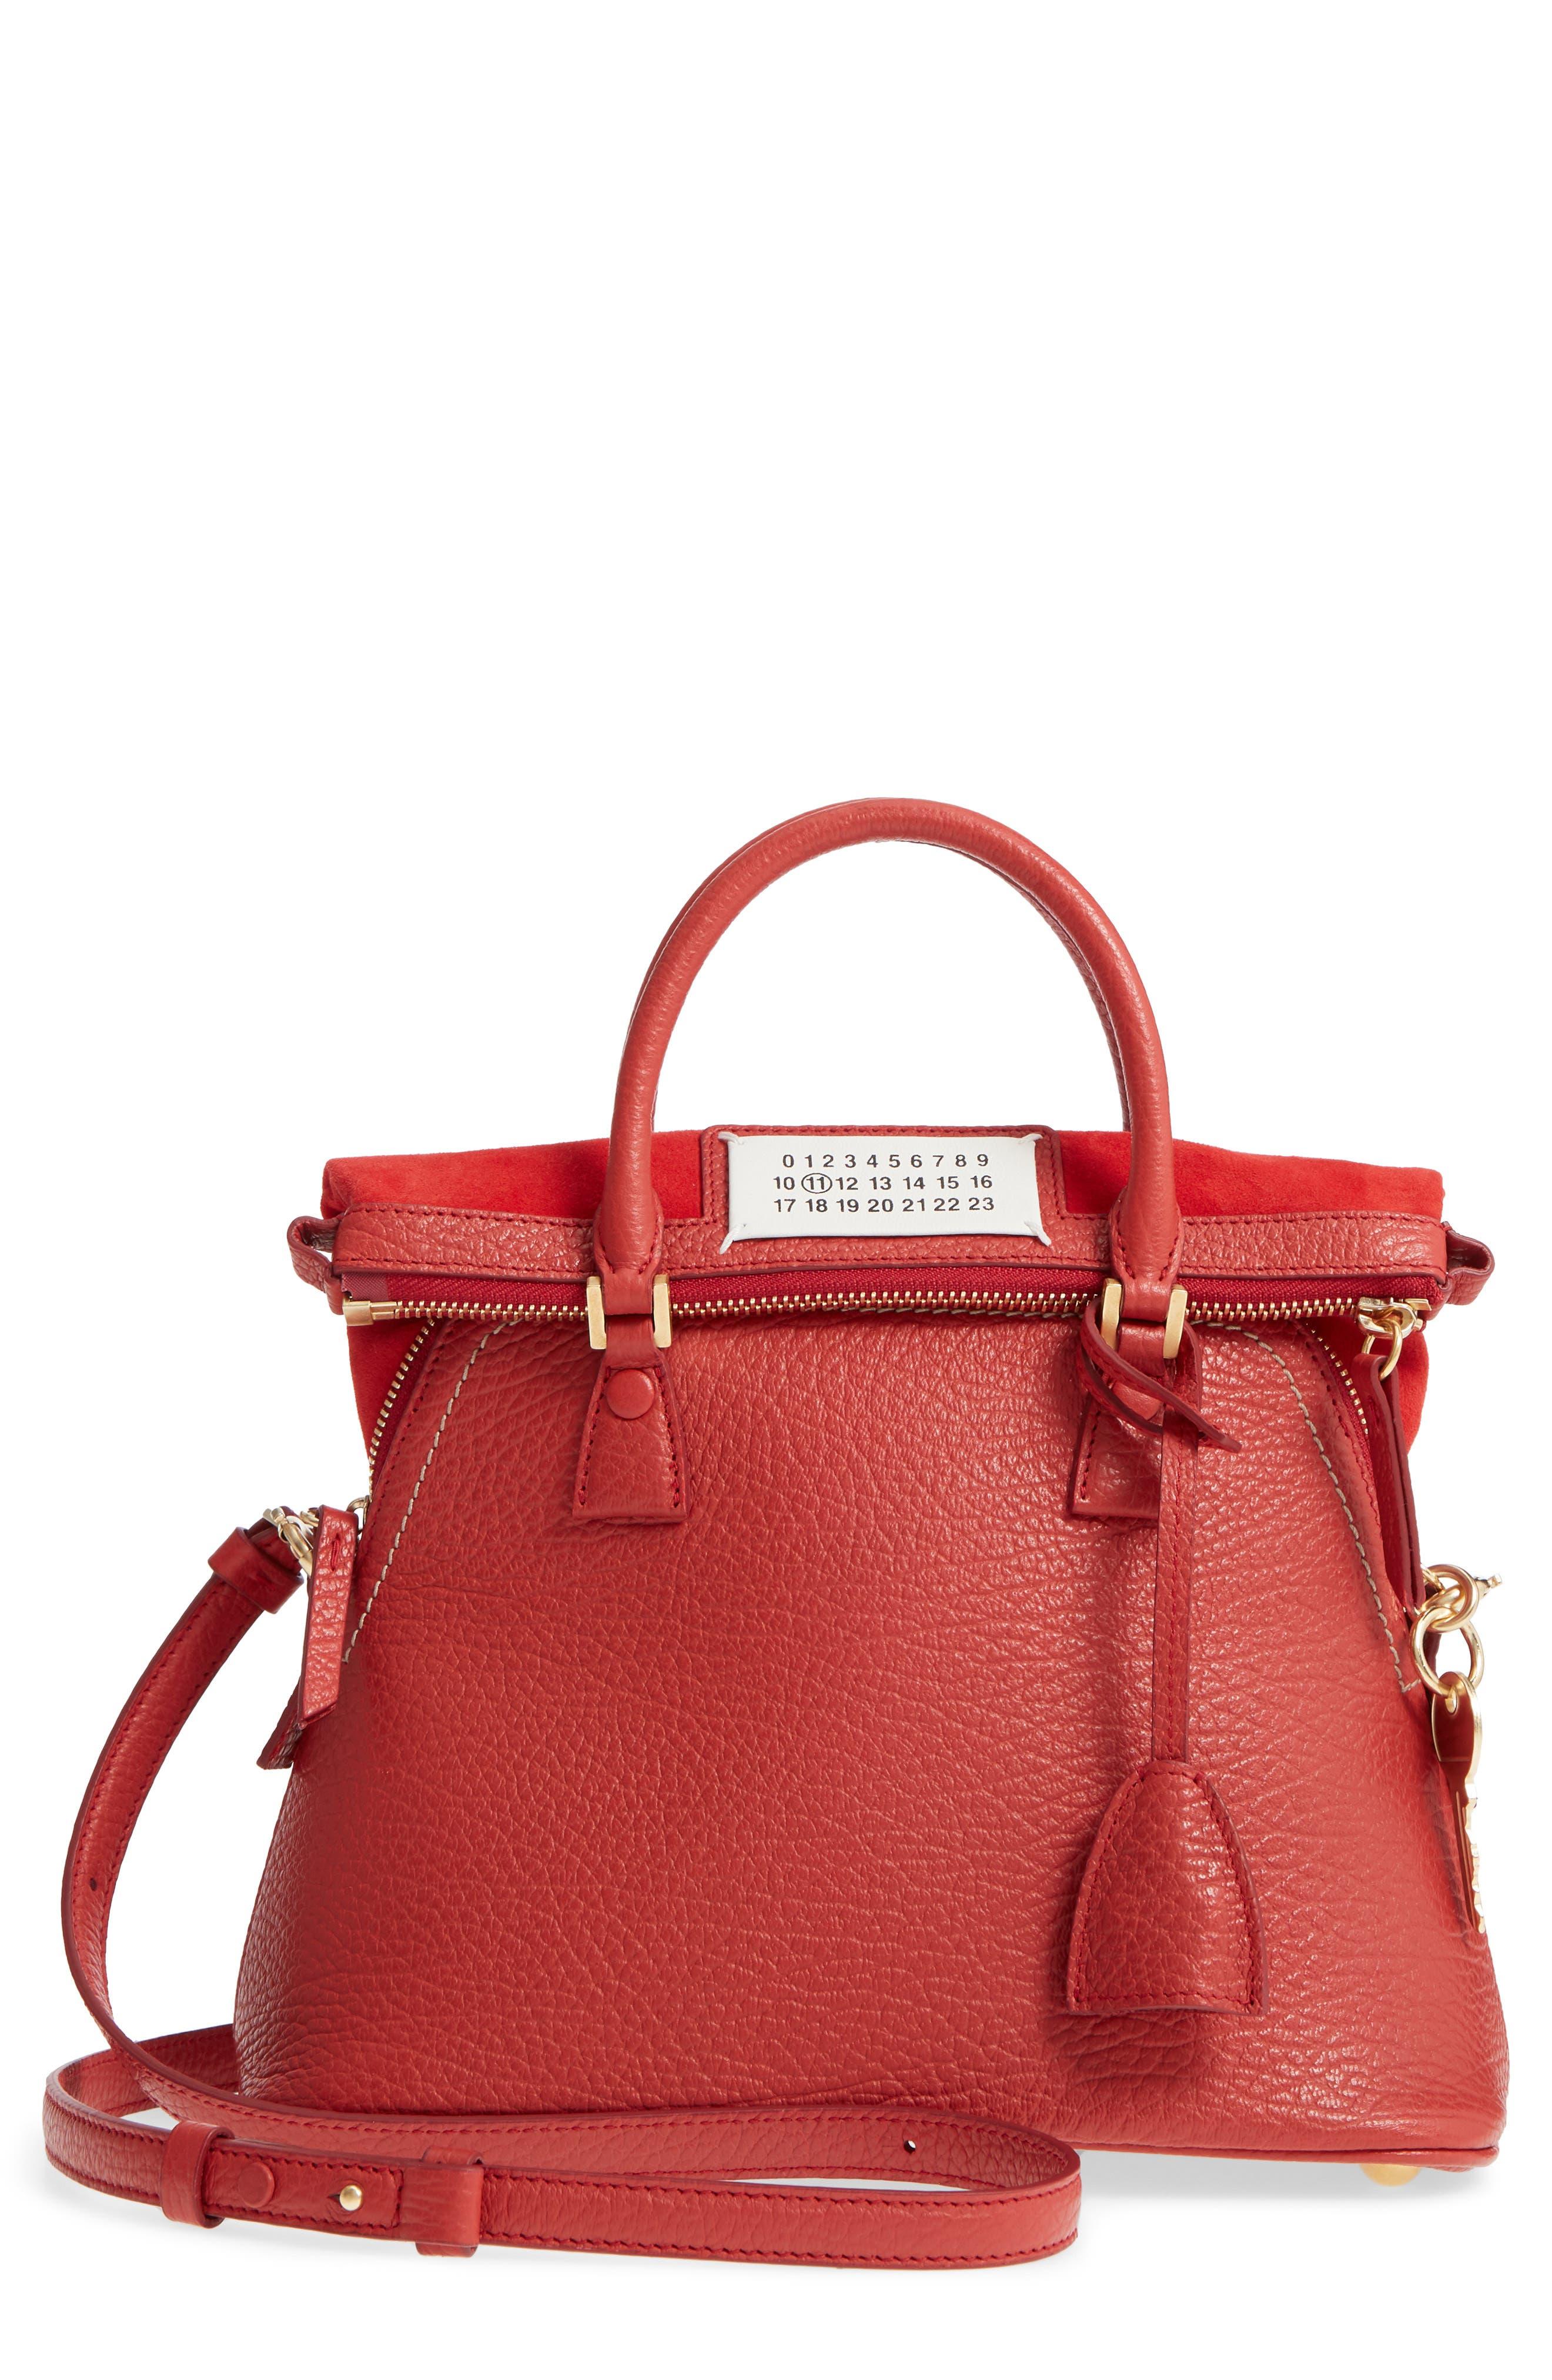 Small 5AC Calfskin Leather Handbag,                             Main thumbnail 1, color,                             600